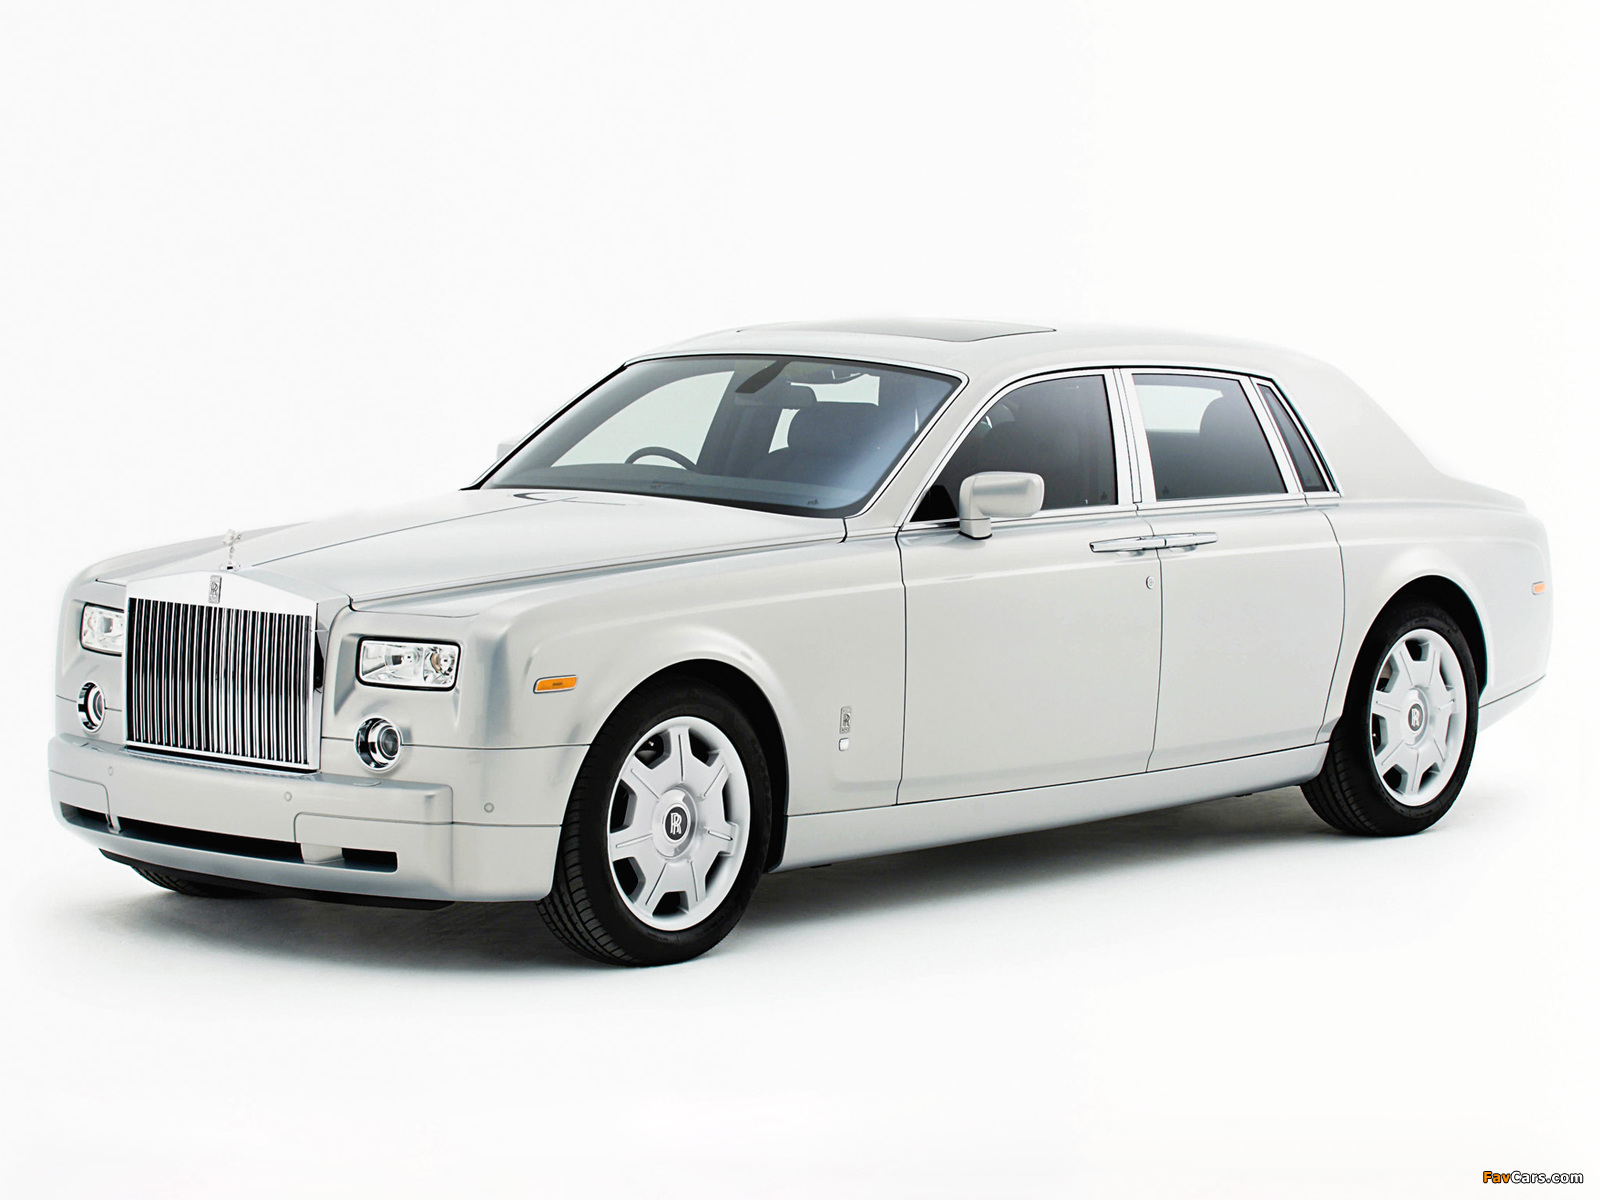 Rolls-Royce Phantom Silver Edition 2007 photos (1600 x 1200)